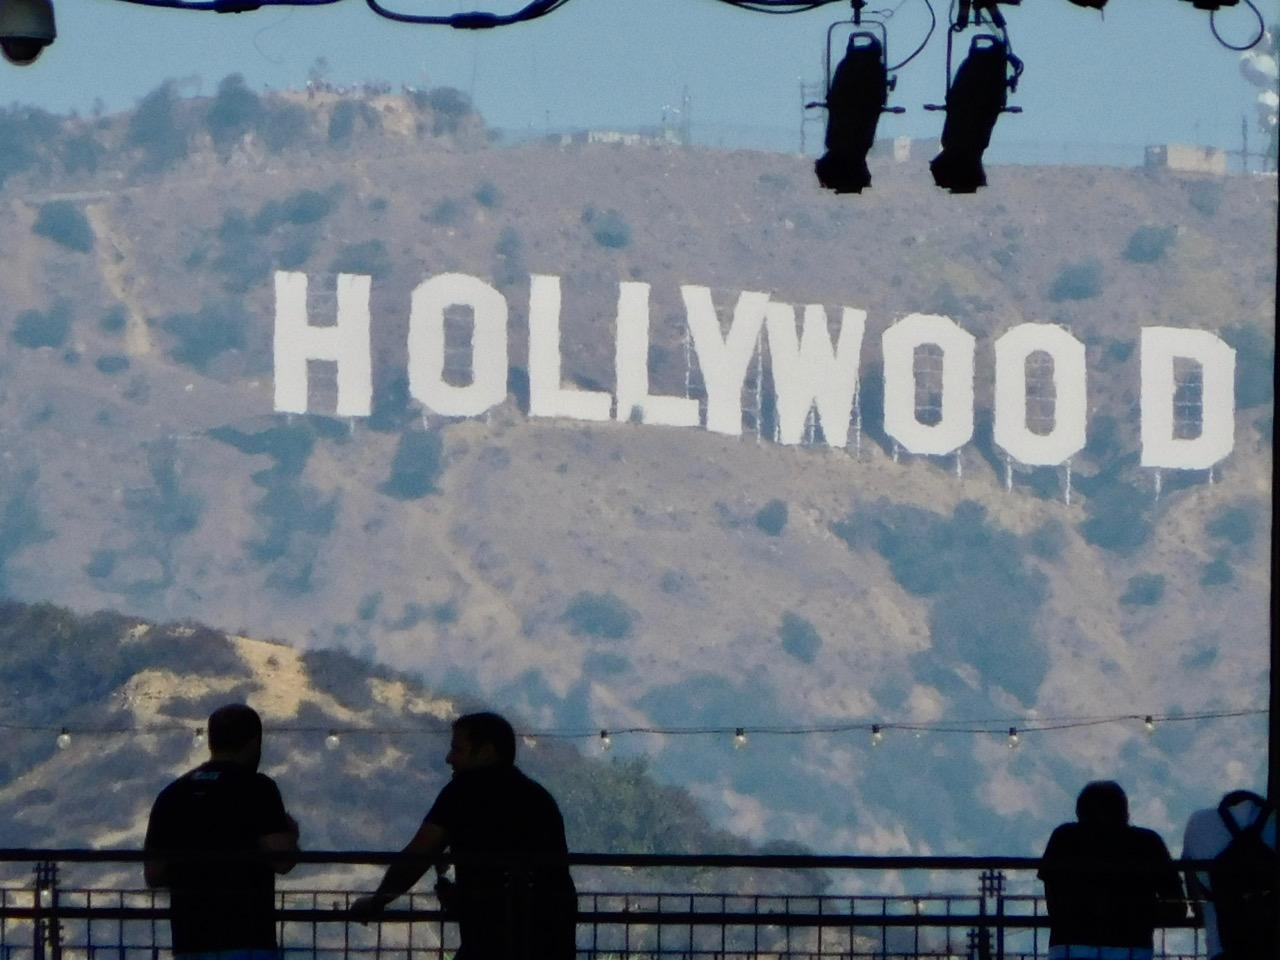 3 Days in Hollywood - Hollywood Boulevard (10)